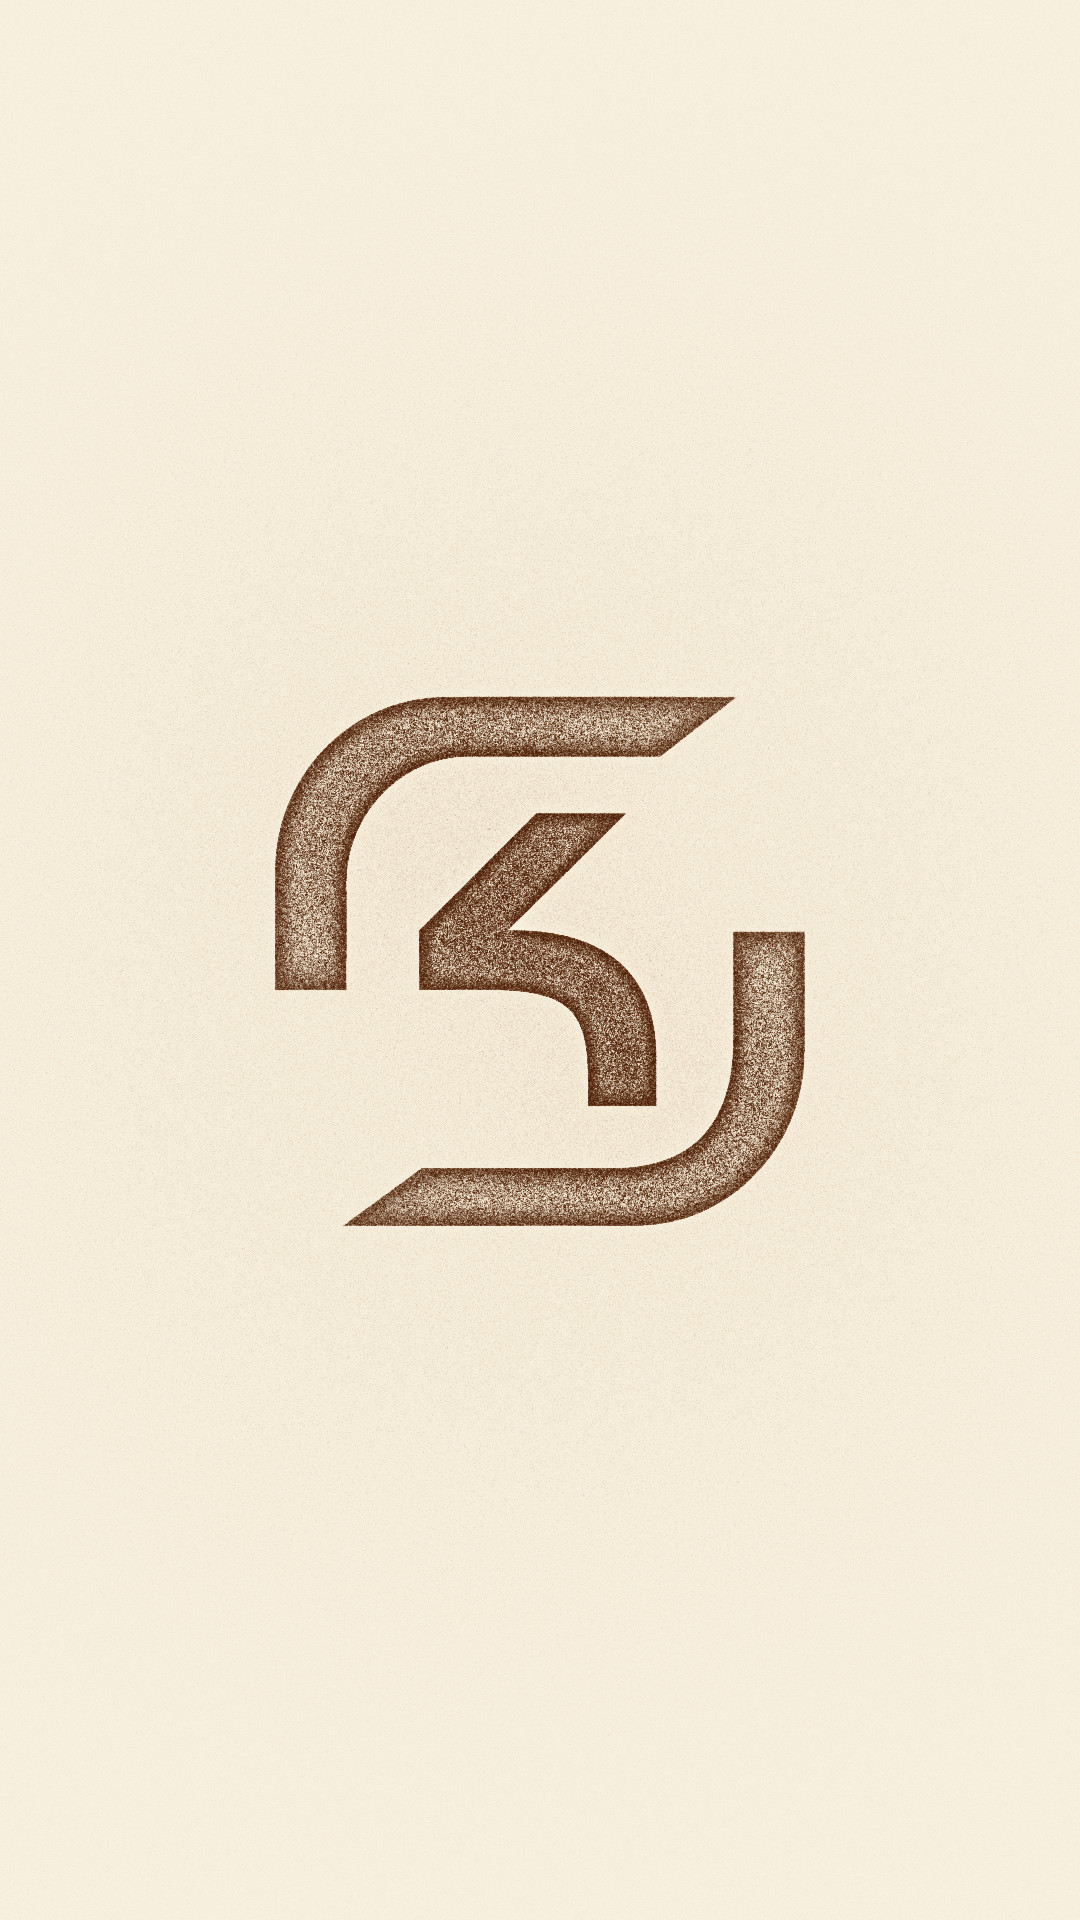 SK Gaming – Mobile